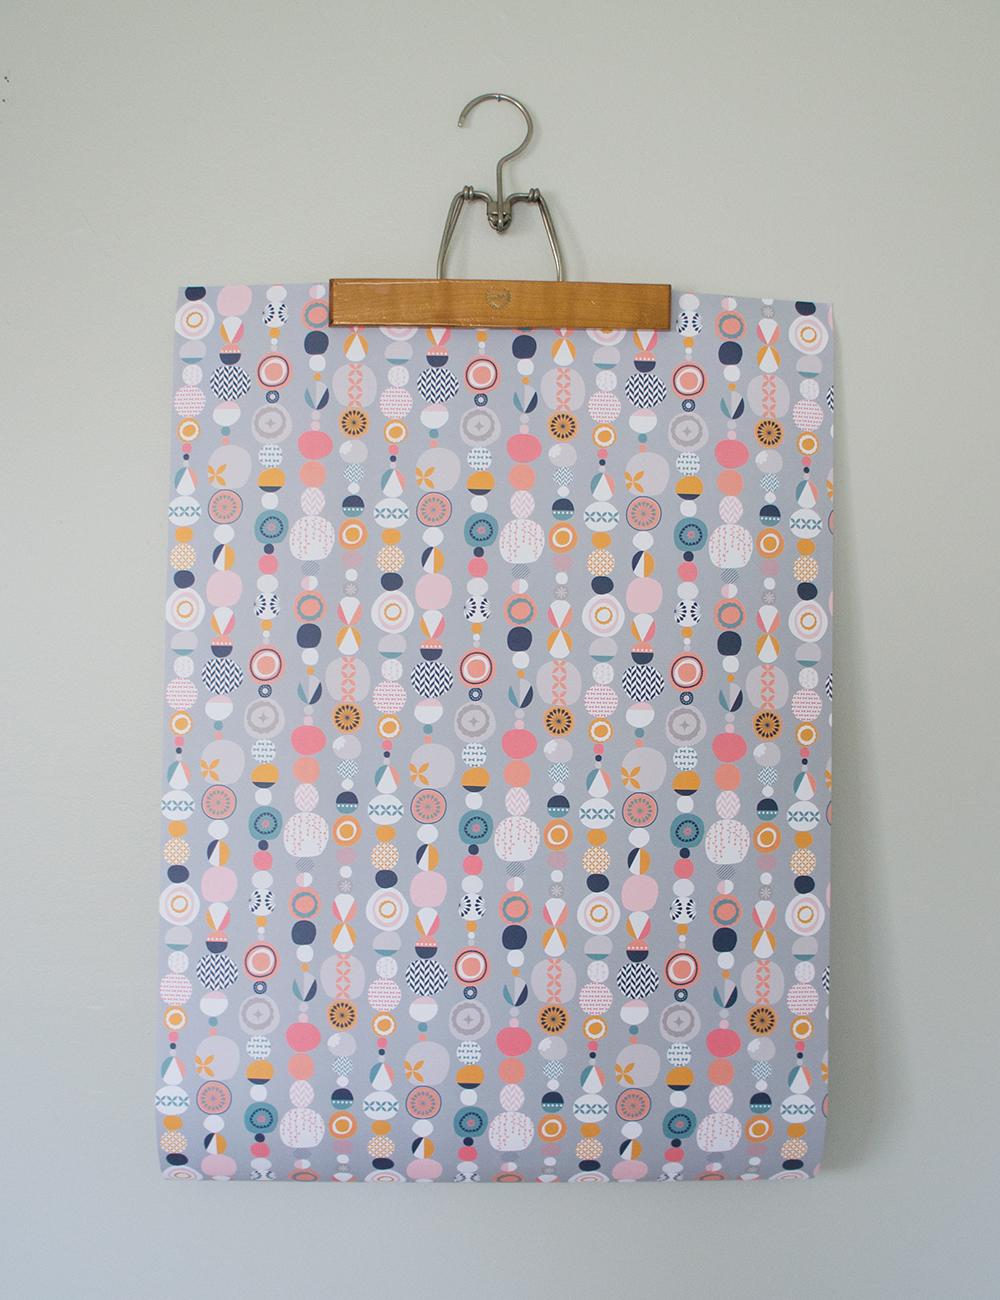 JamboreeGeo Gift Wrap Paper Assortment